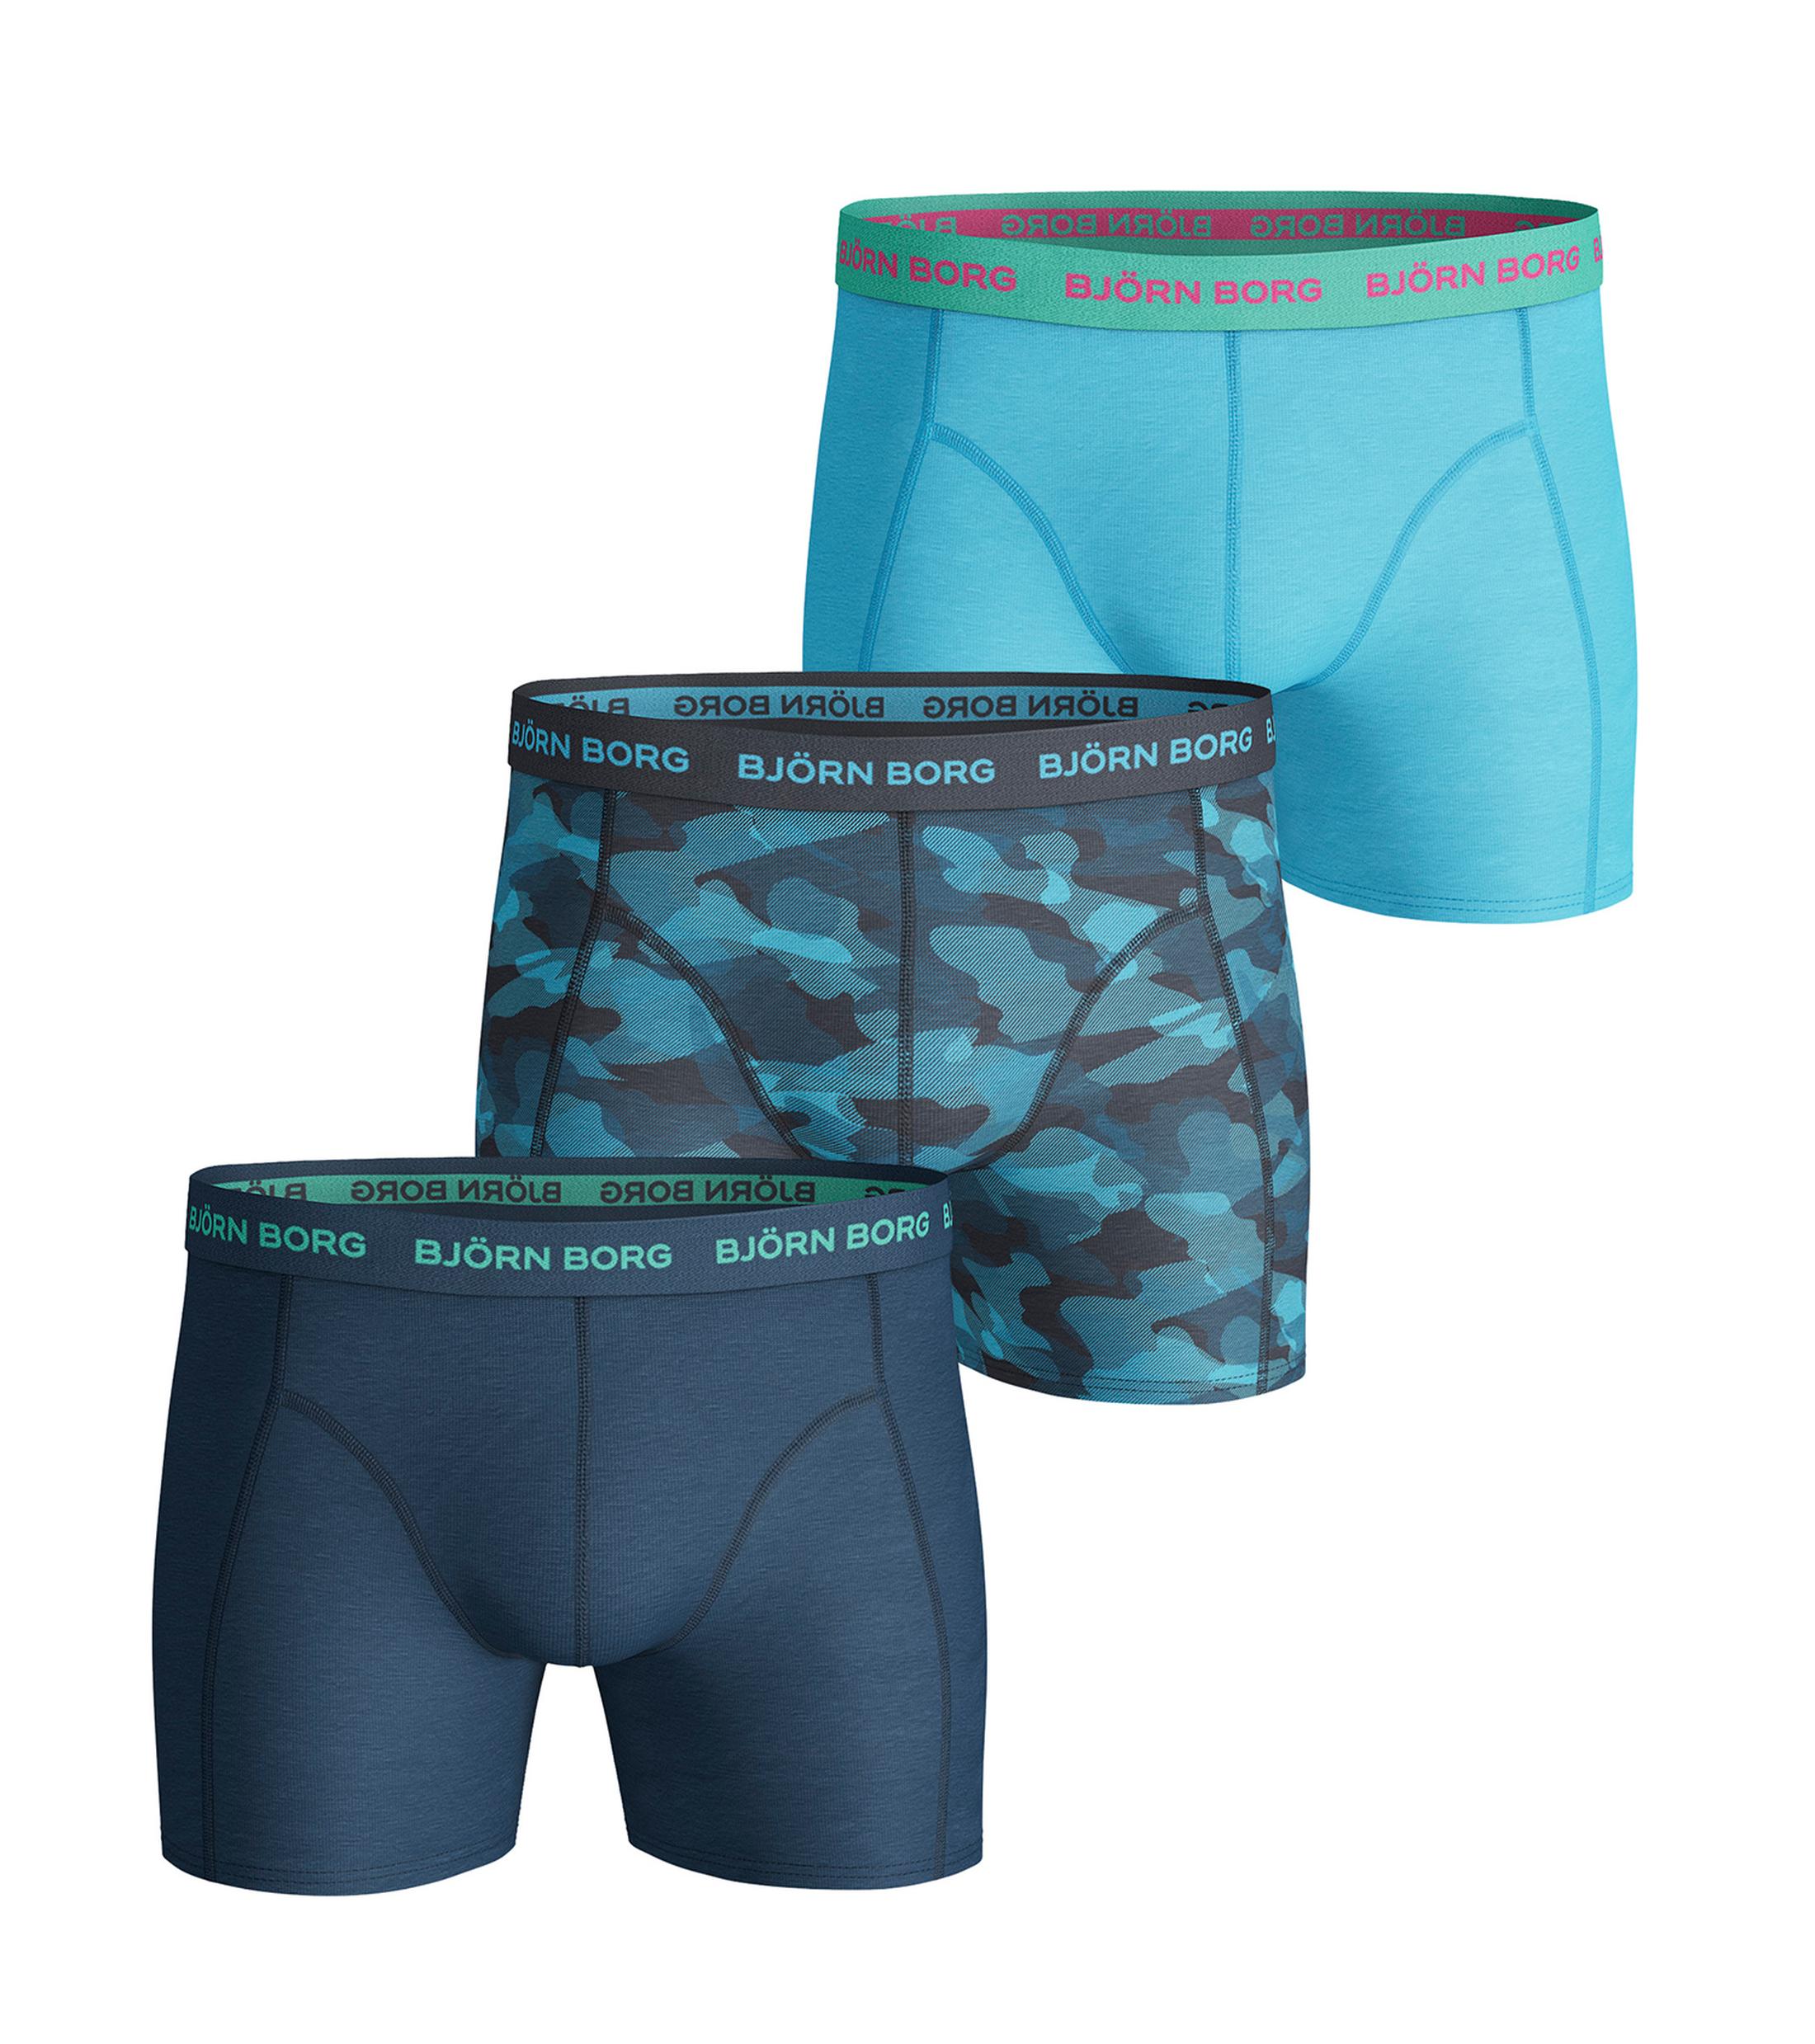 bjorn borg boxers camo 3pack blauw online bestellen suitable. Black Bedroom Furniture Sets. Home Design Ideas